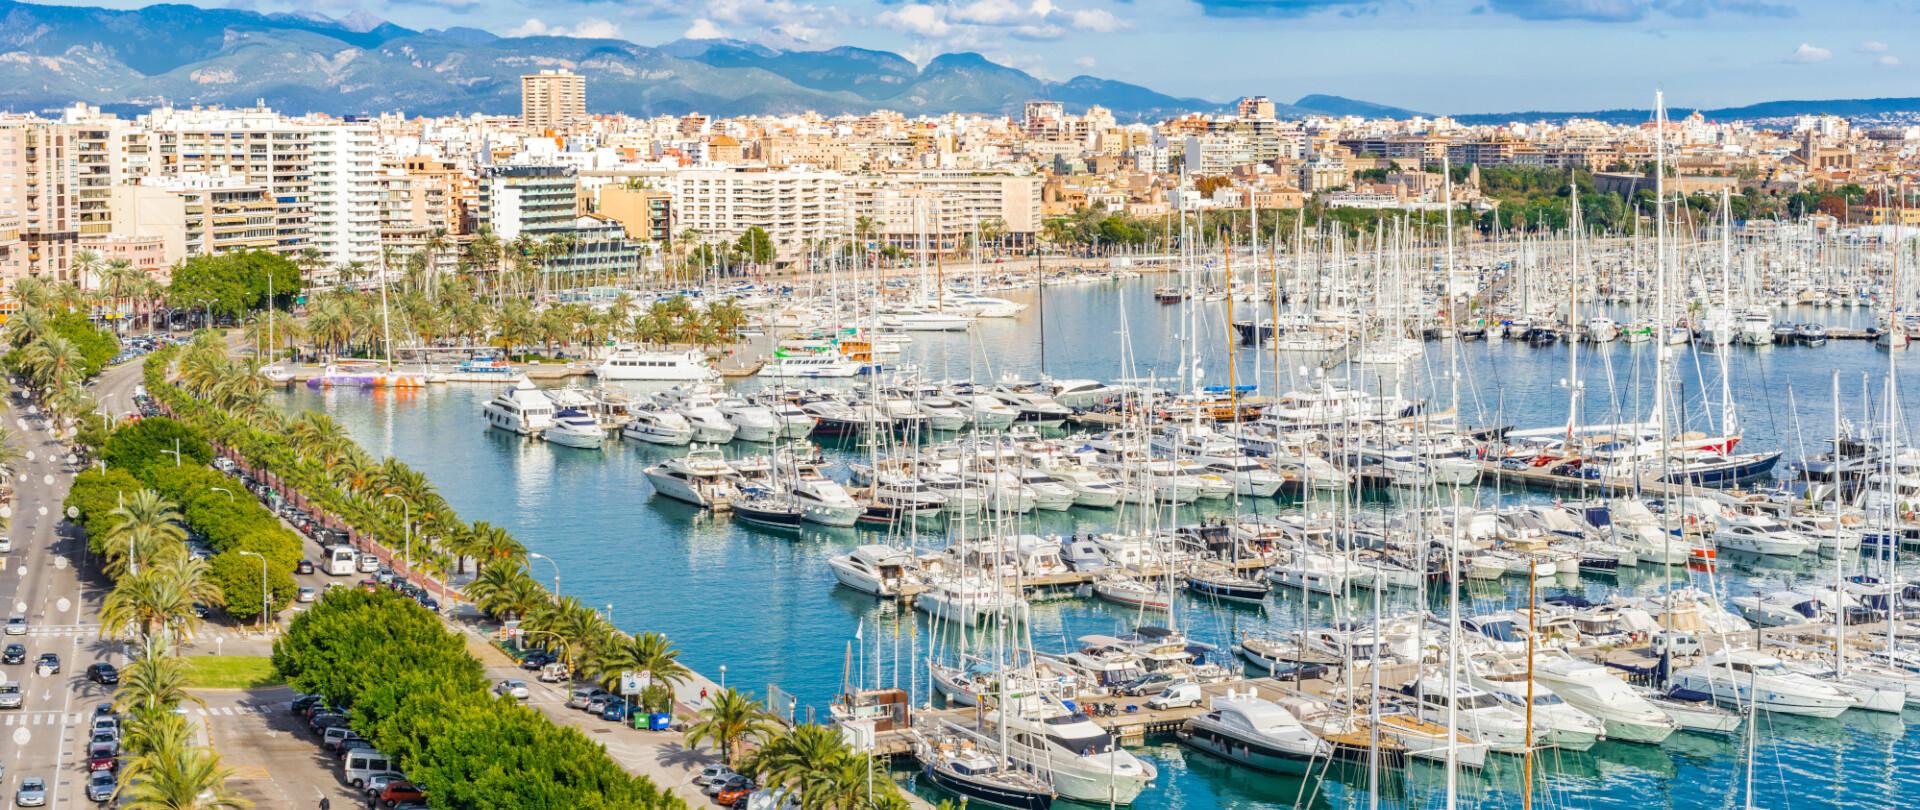 The Palma Superyacht Show 2021